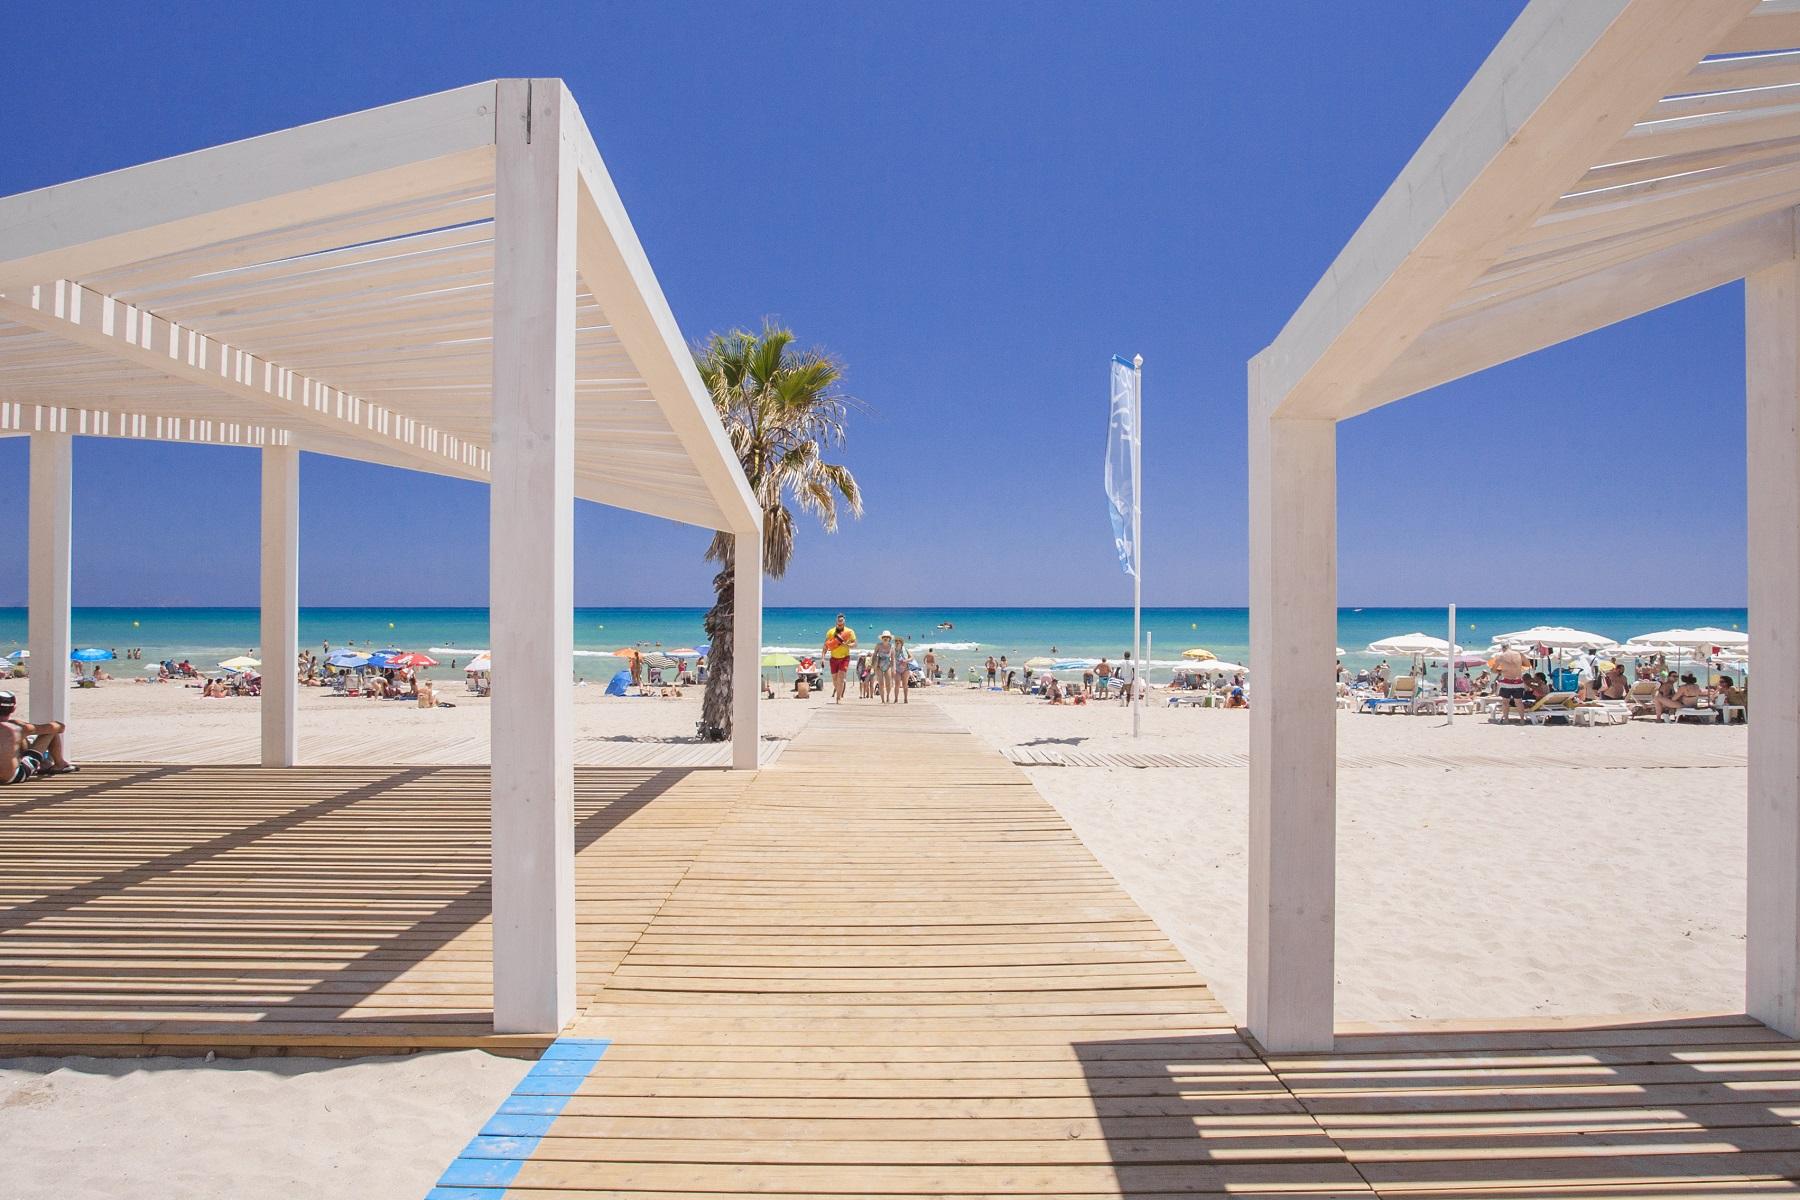 Playa de San Juan - ALICANTE City & Beach